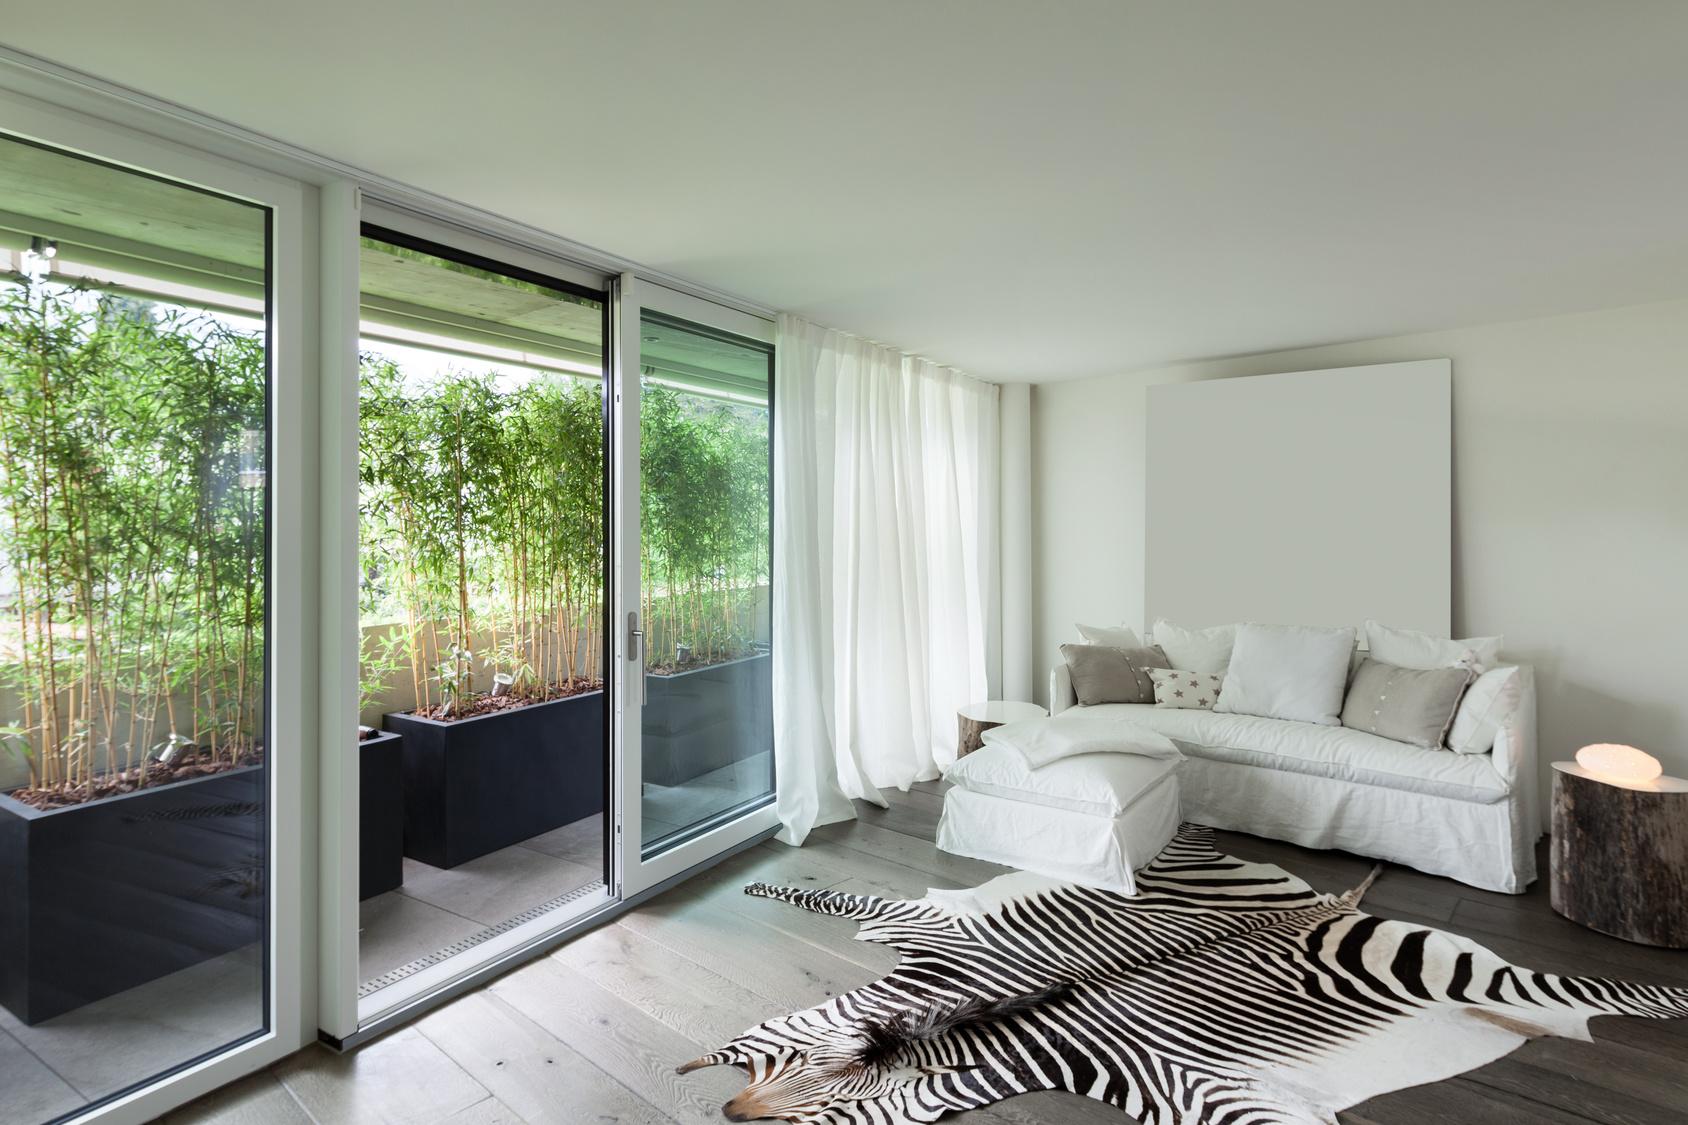 Decoración ideal passivhaus